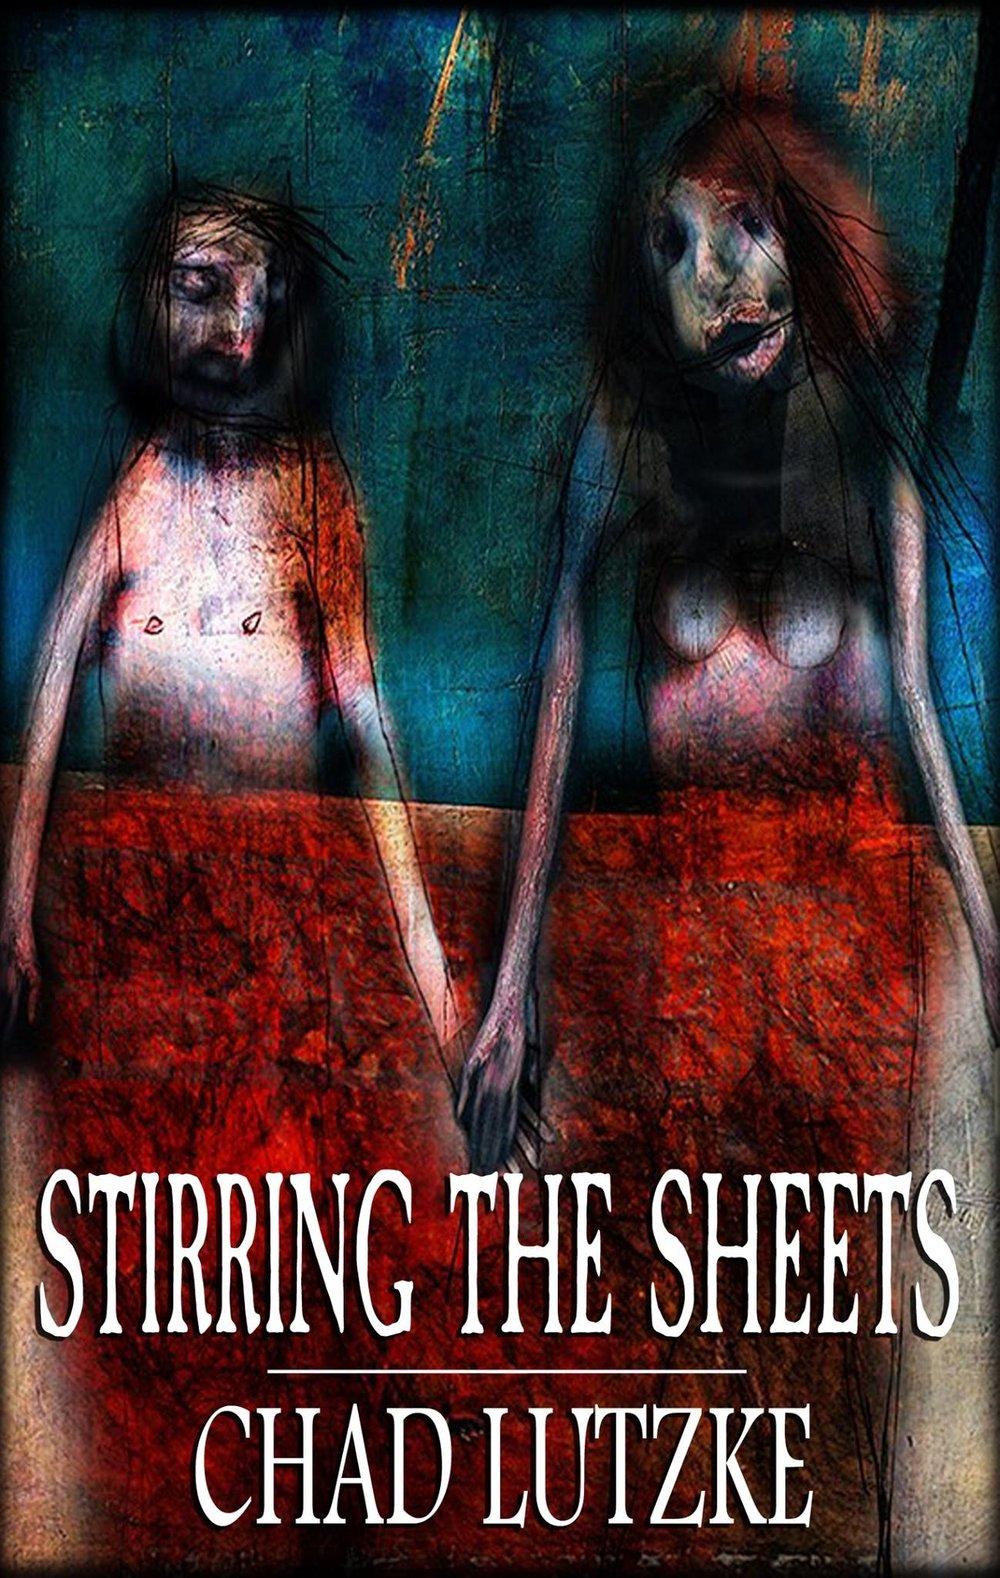 Stirring the Sheets_Chad Lutzke.jpg